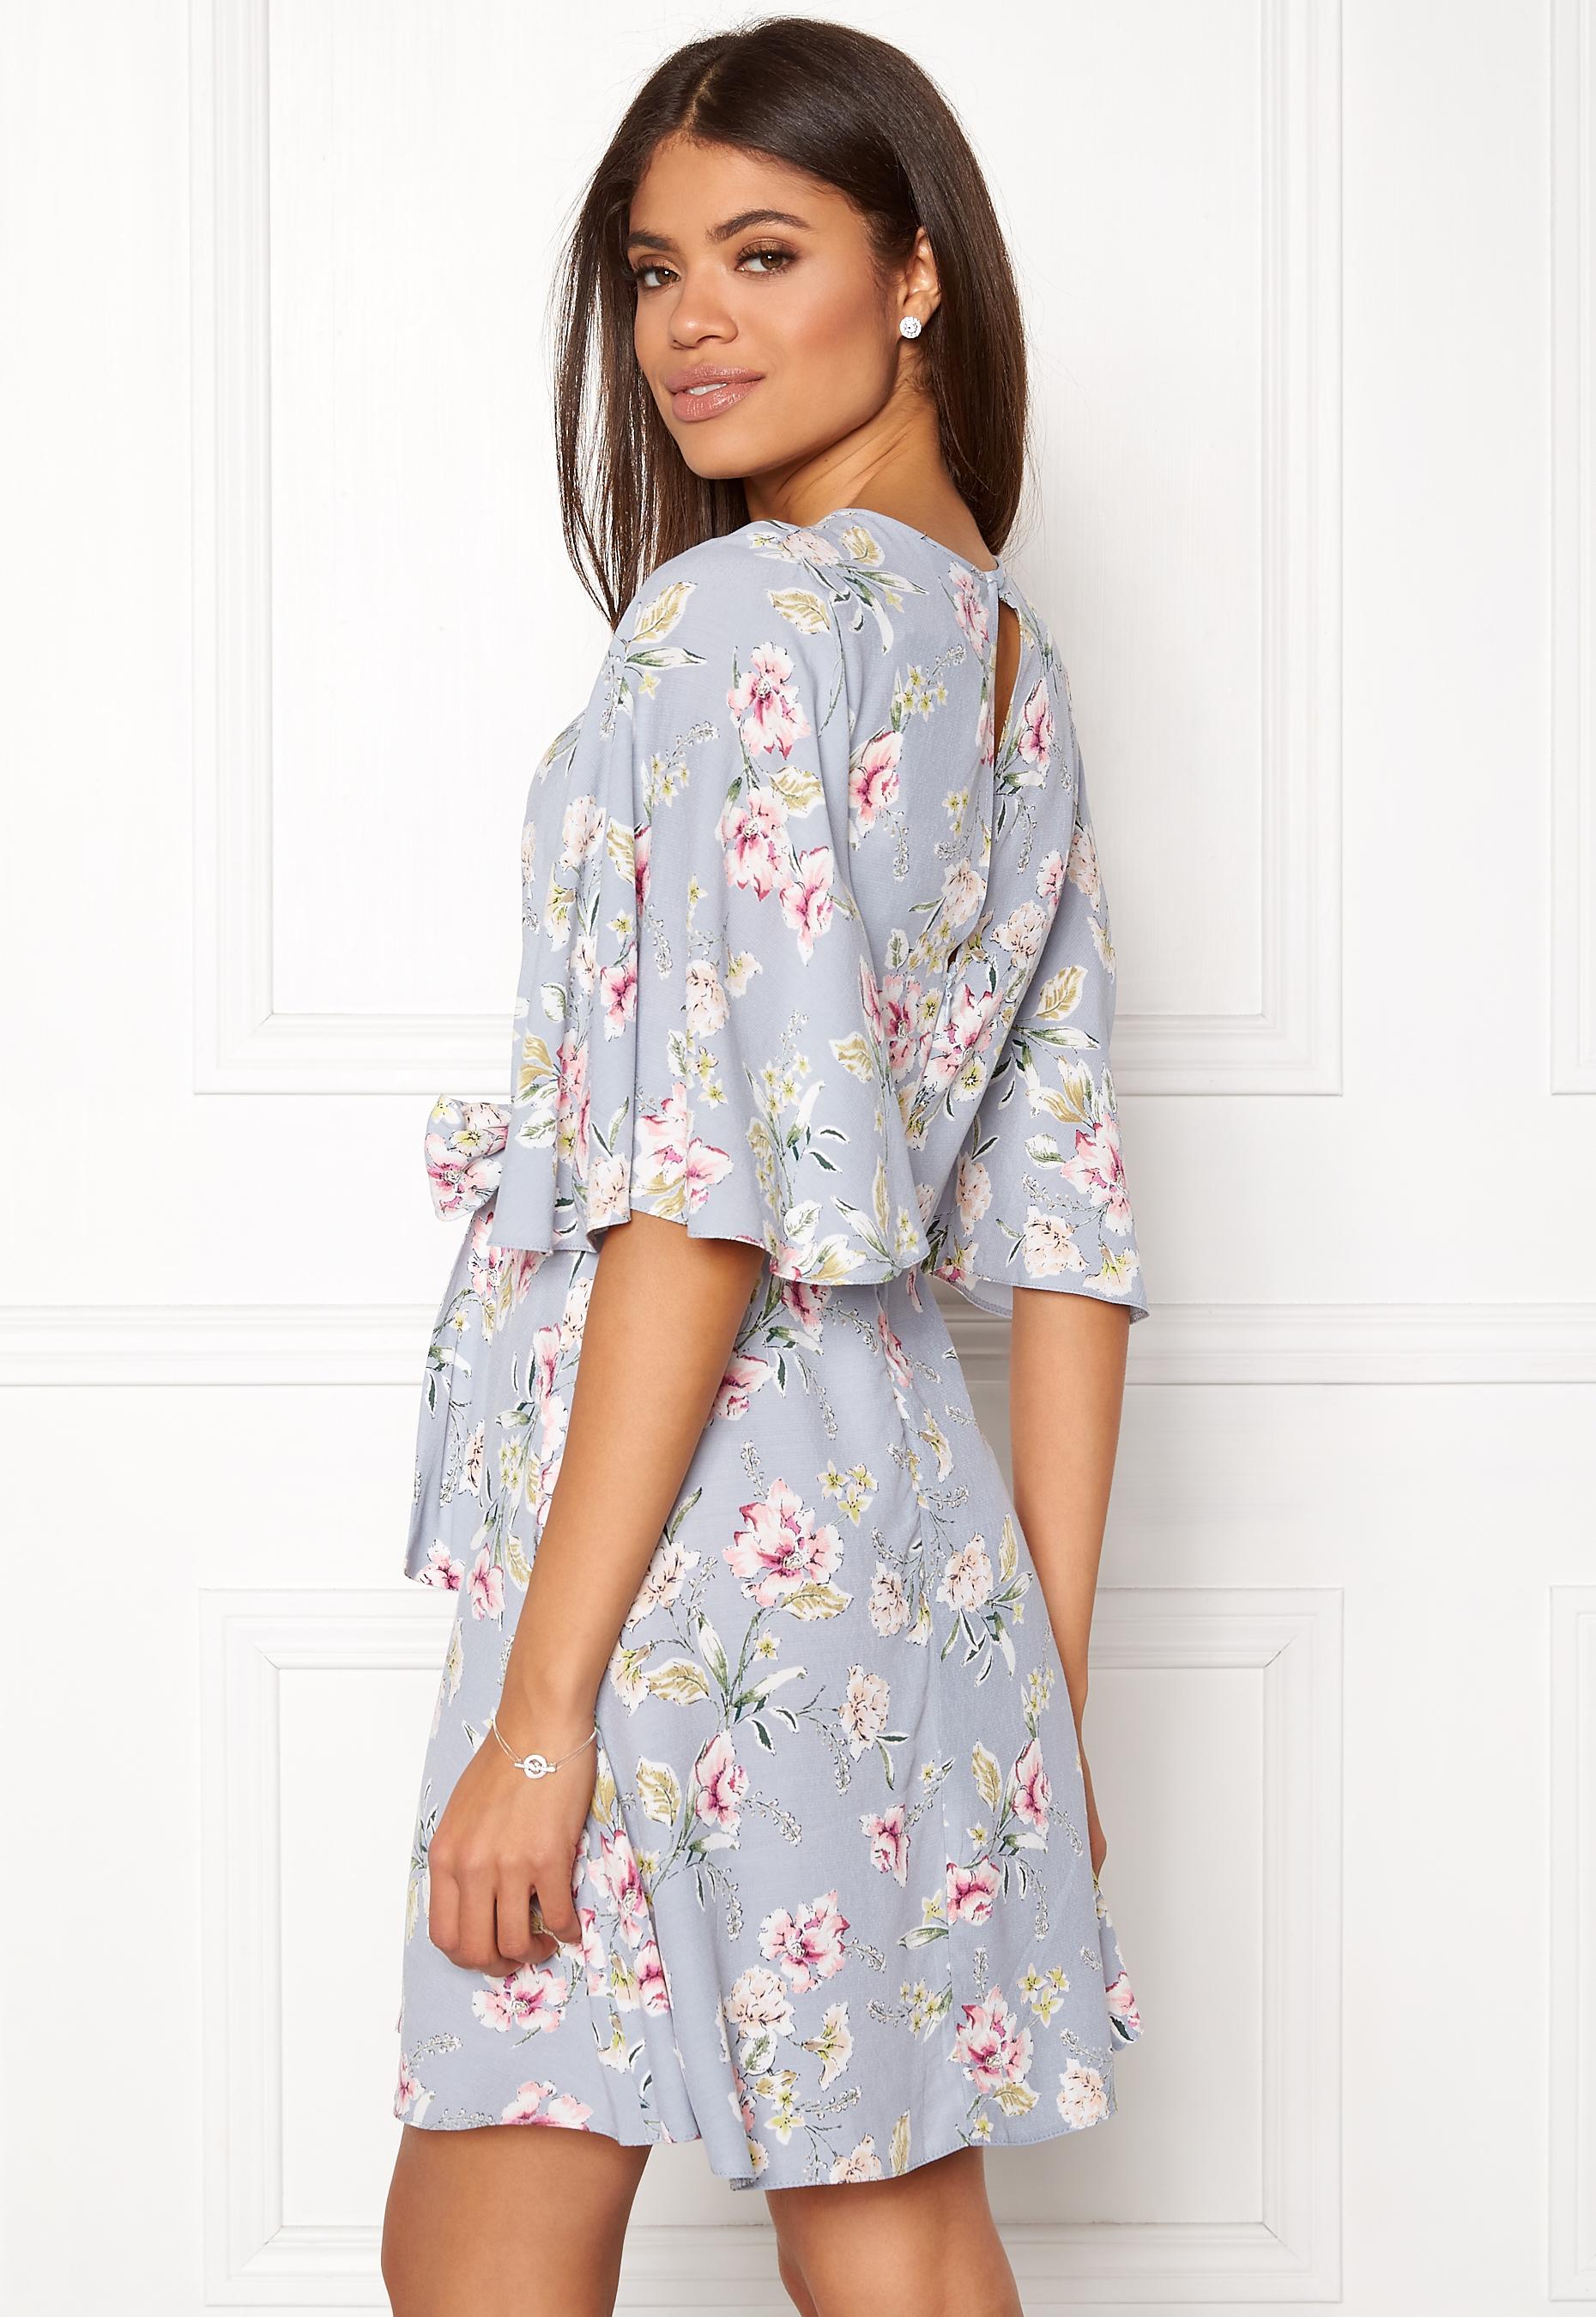 New Look Frances Floral Knot Dress Light Grey - Bubbleroom b1233c87efeab